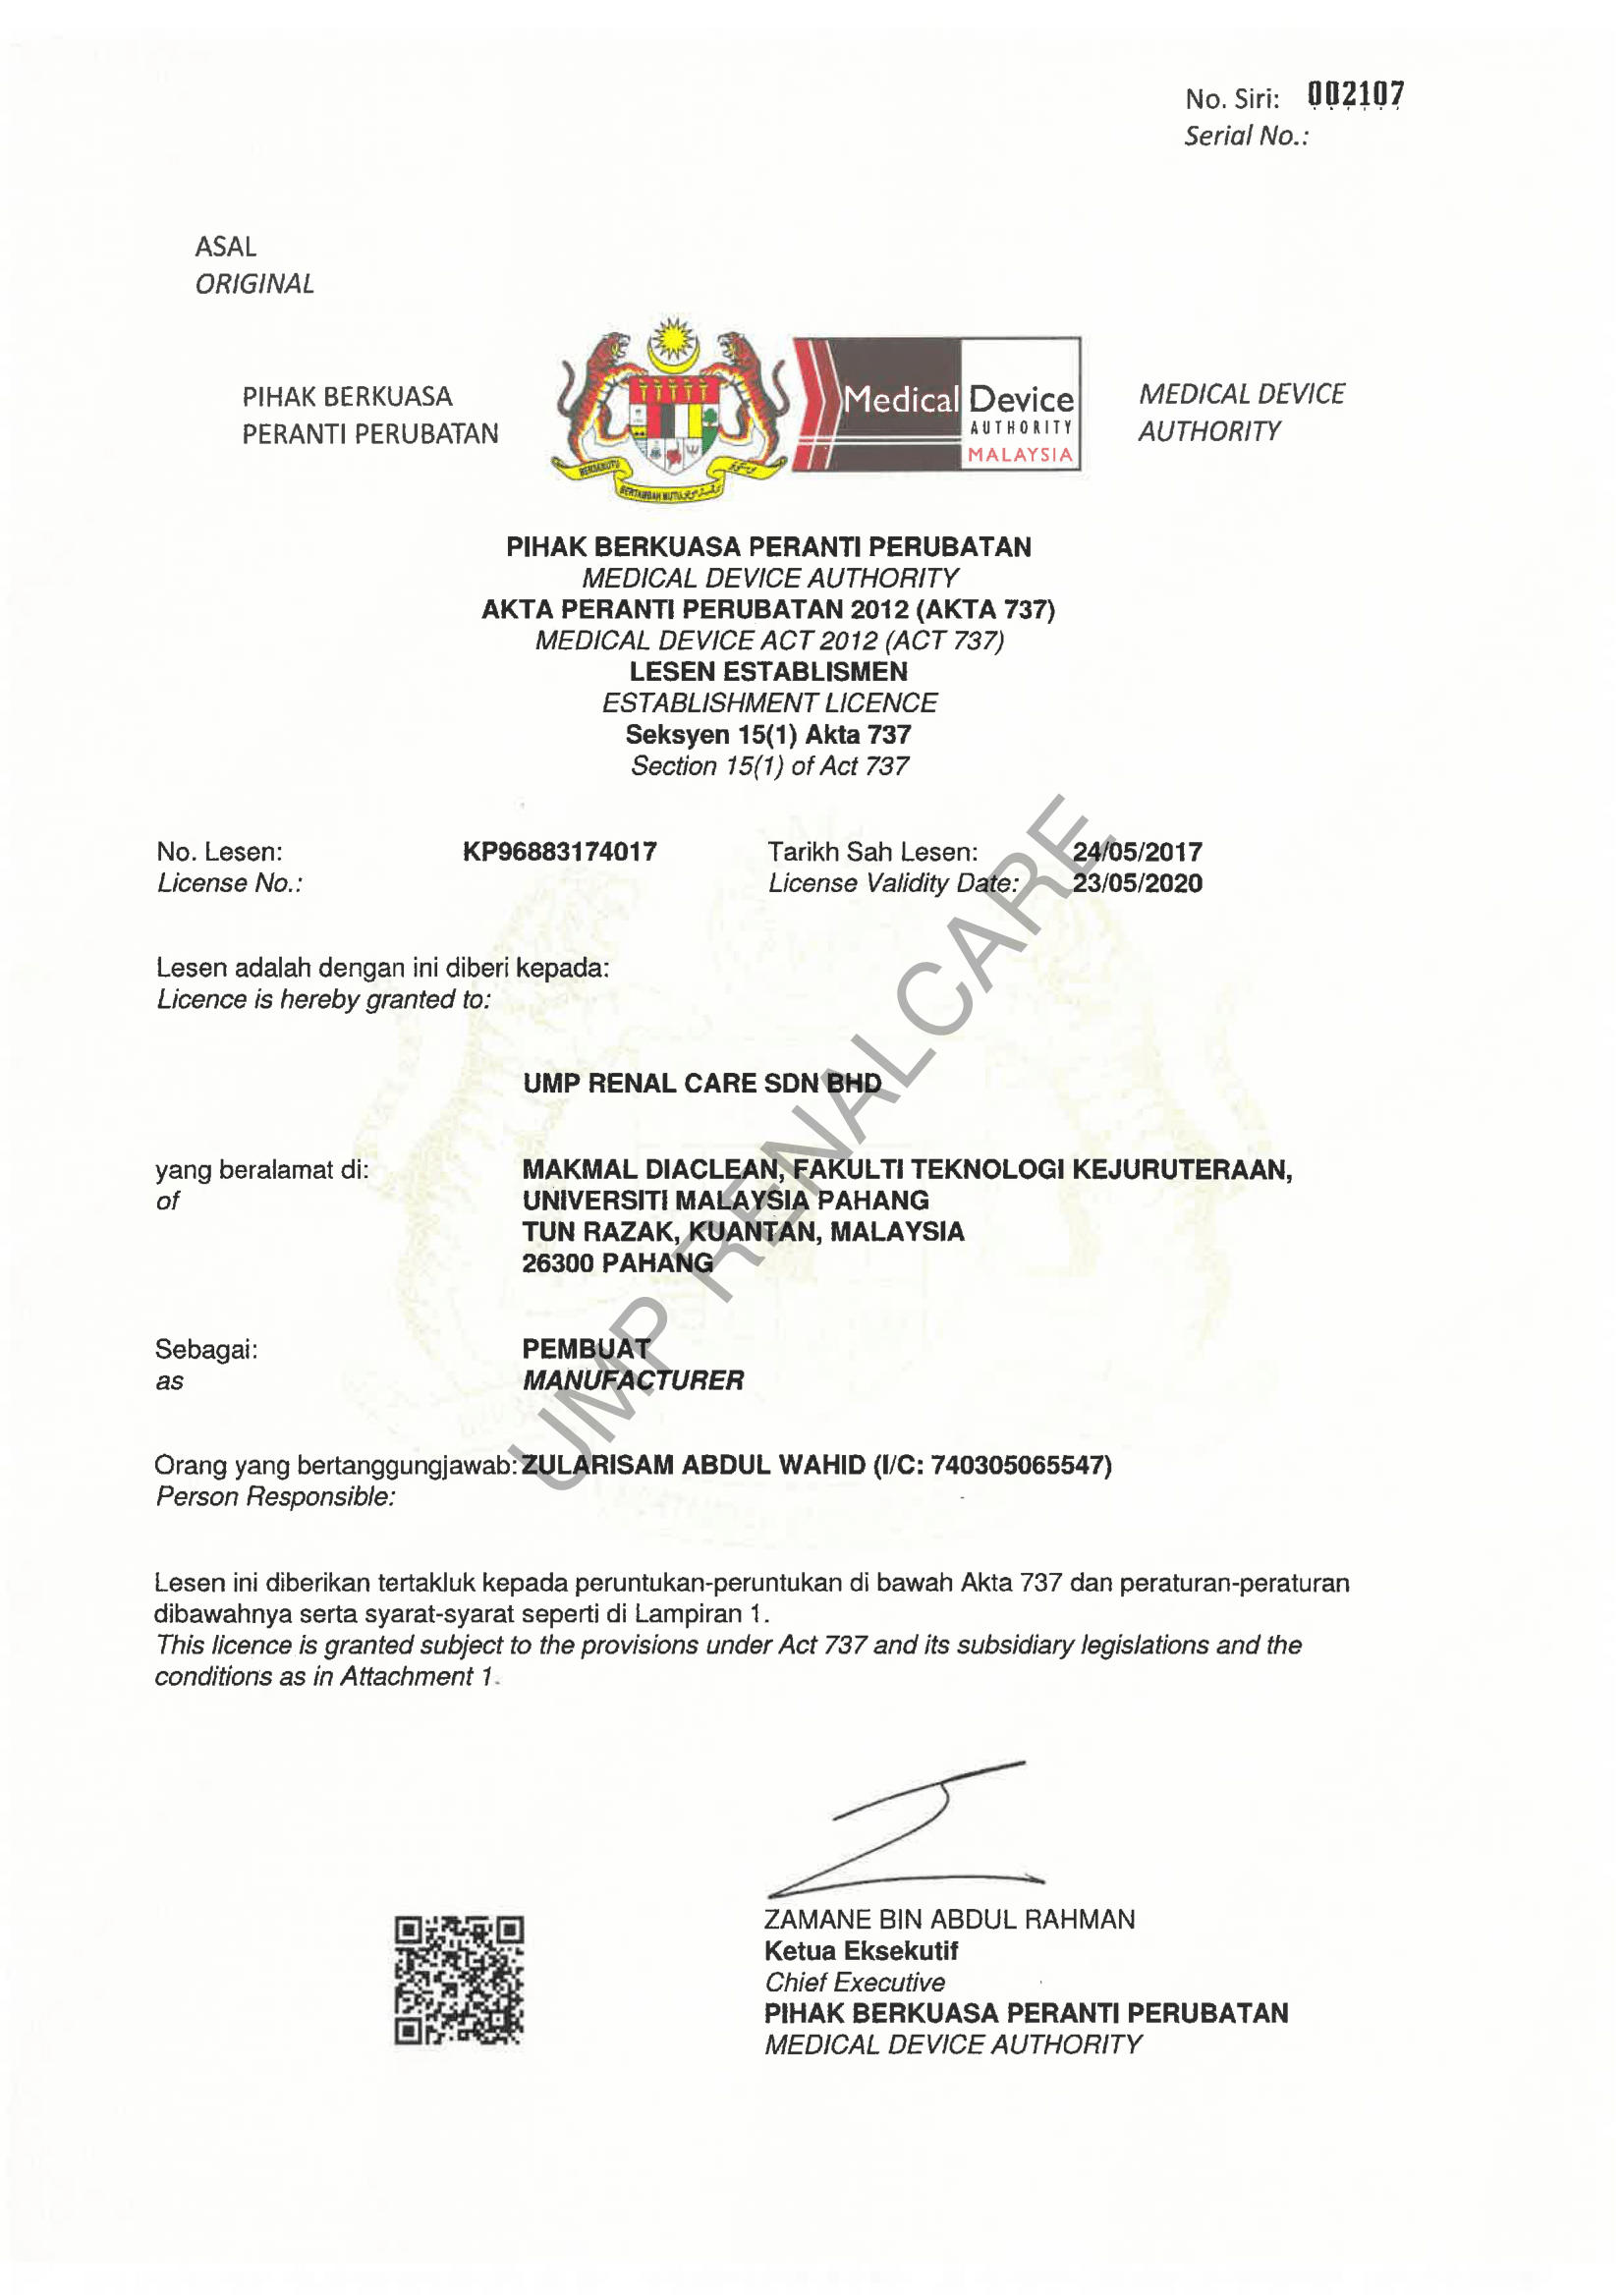 Establishment License